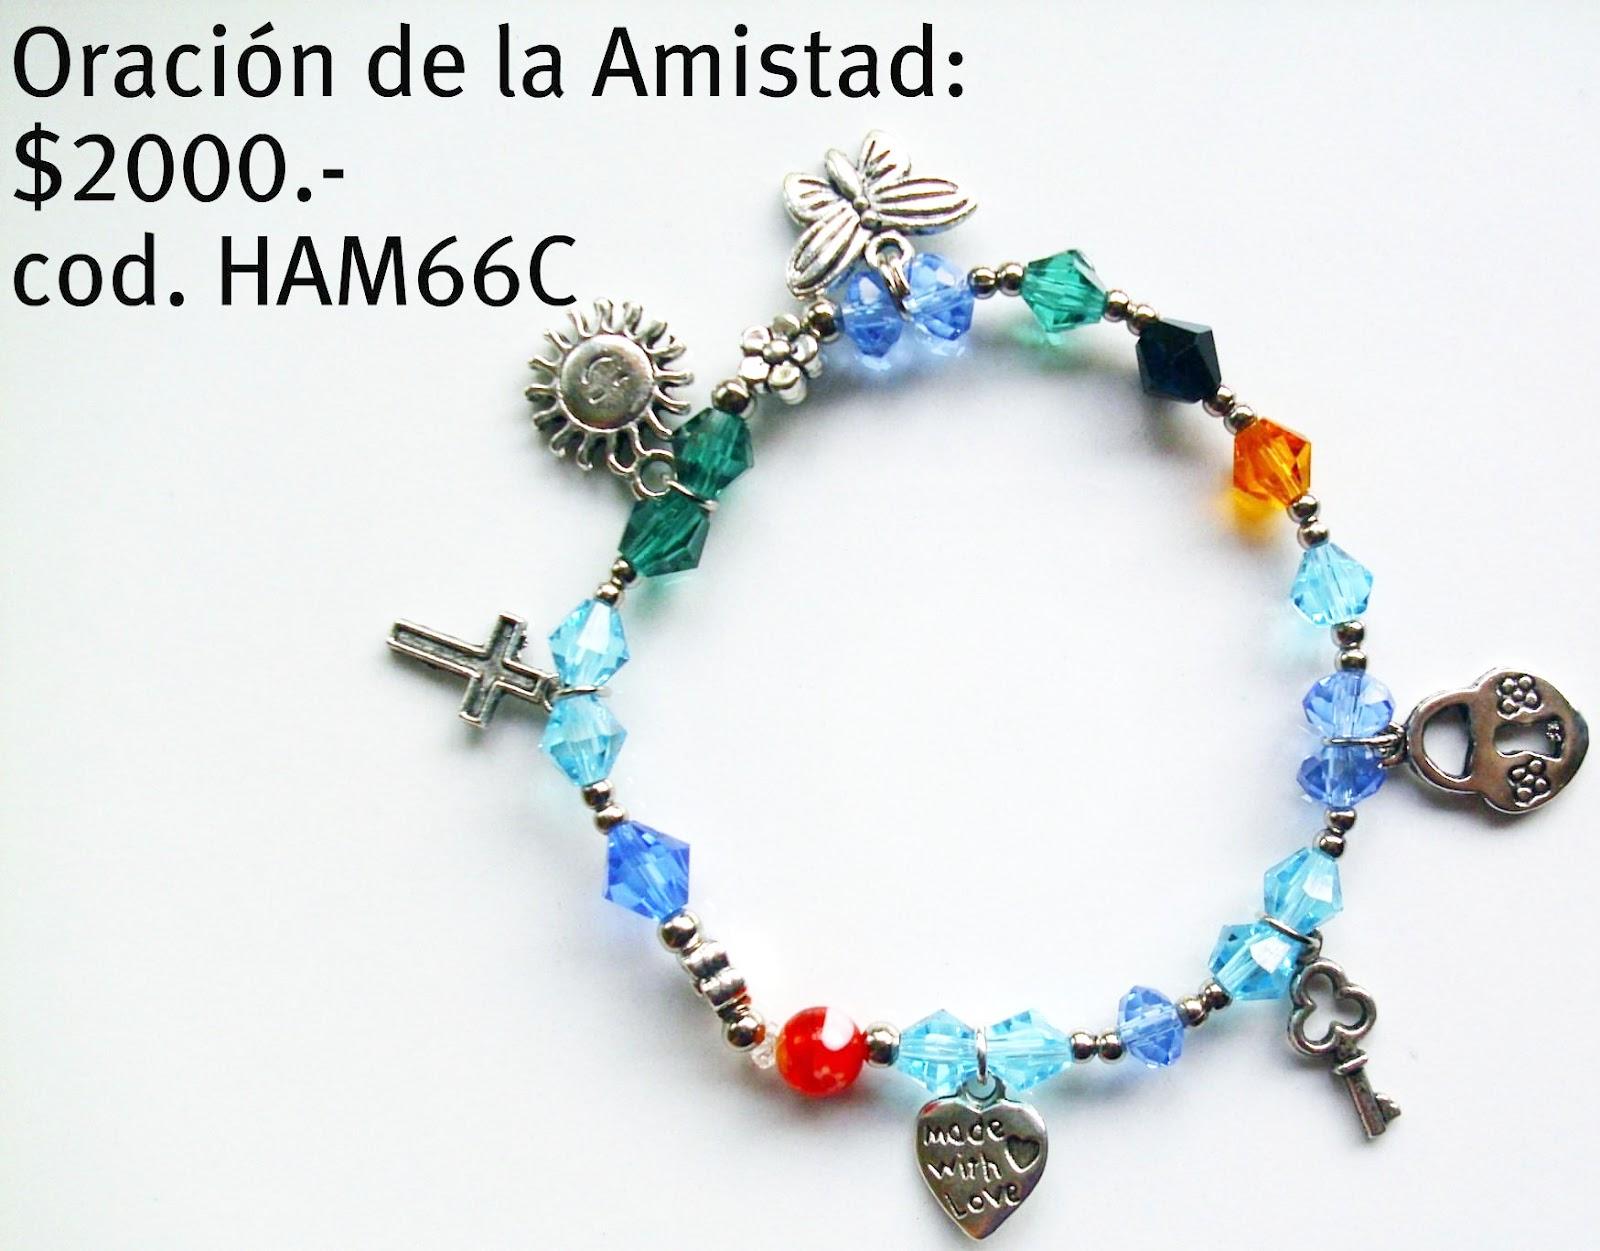 874e013a4a1d Stilos online  Catálogo  Pulsera ORACIÓN DE LA AMISTAD